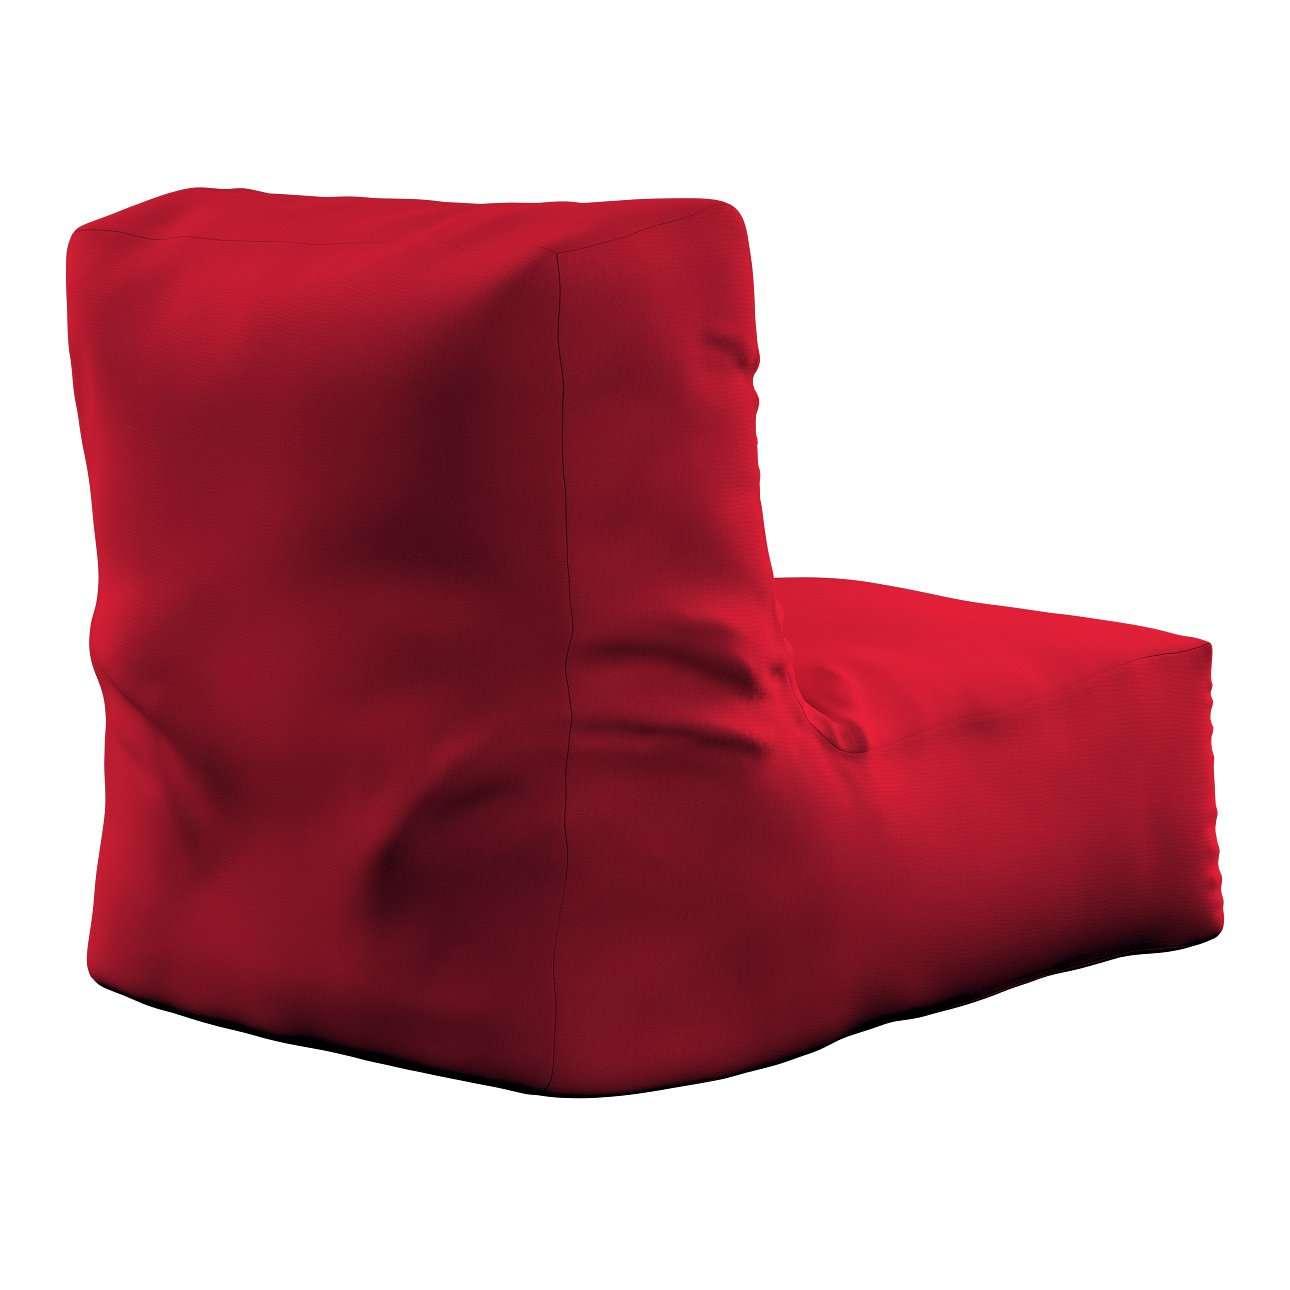 Pufa- fotel w kolekcji Etna, tkanina: 705-60